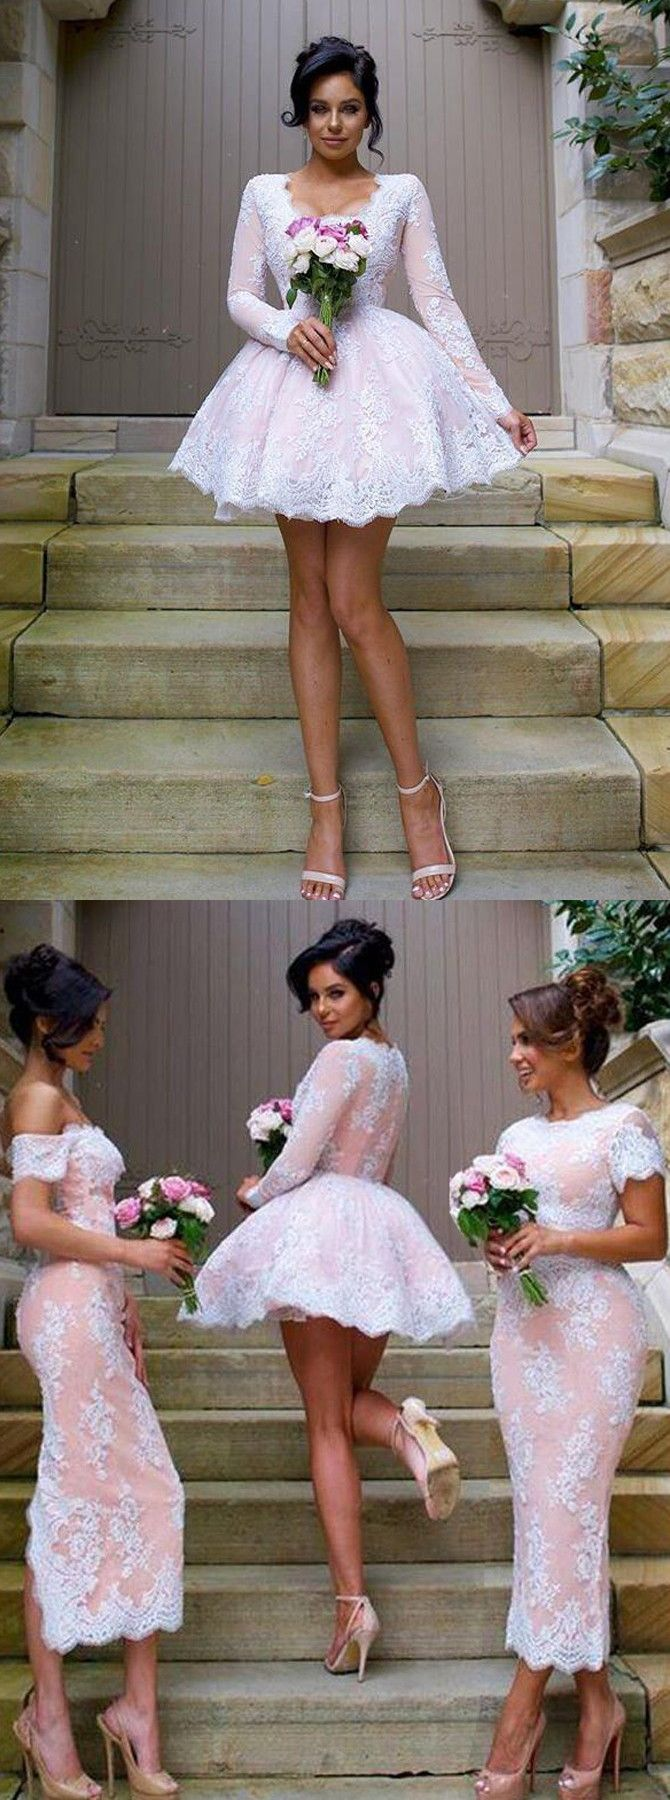 Short Bridesmaid Dresses Lace Bridesmaid Dresses Ball Gown Bridesmaid Dresses Pink Brdiesmaid D Res Ball Gowns Wedding Short Bridesmaid Dresses Bridesmaid Gown [ 1800 x 670 Pixel ]